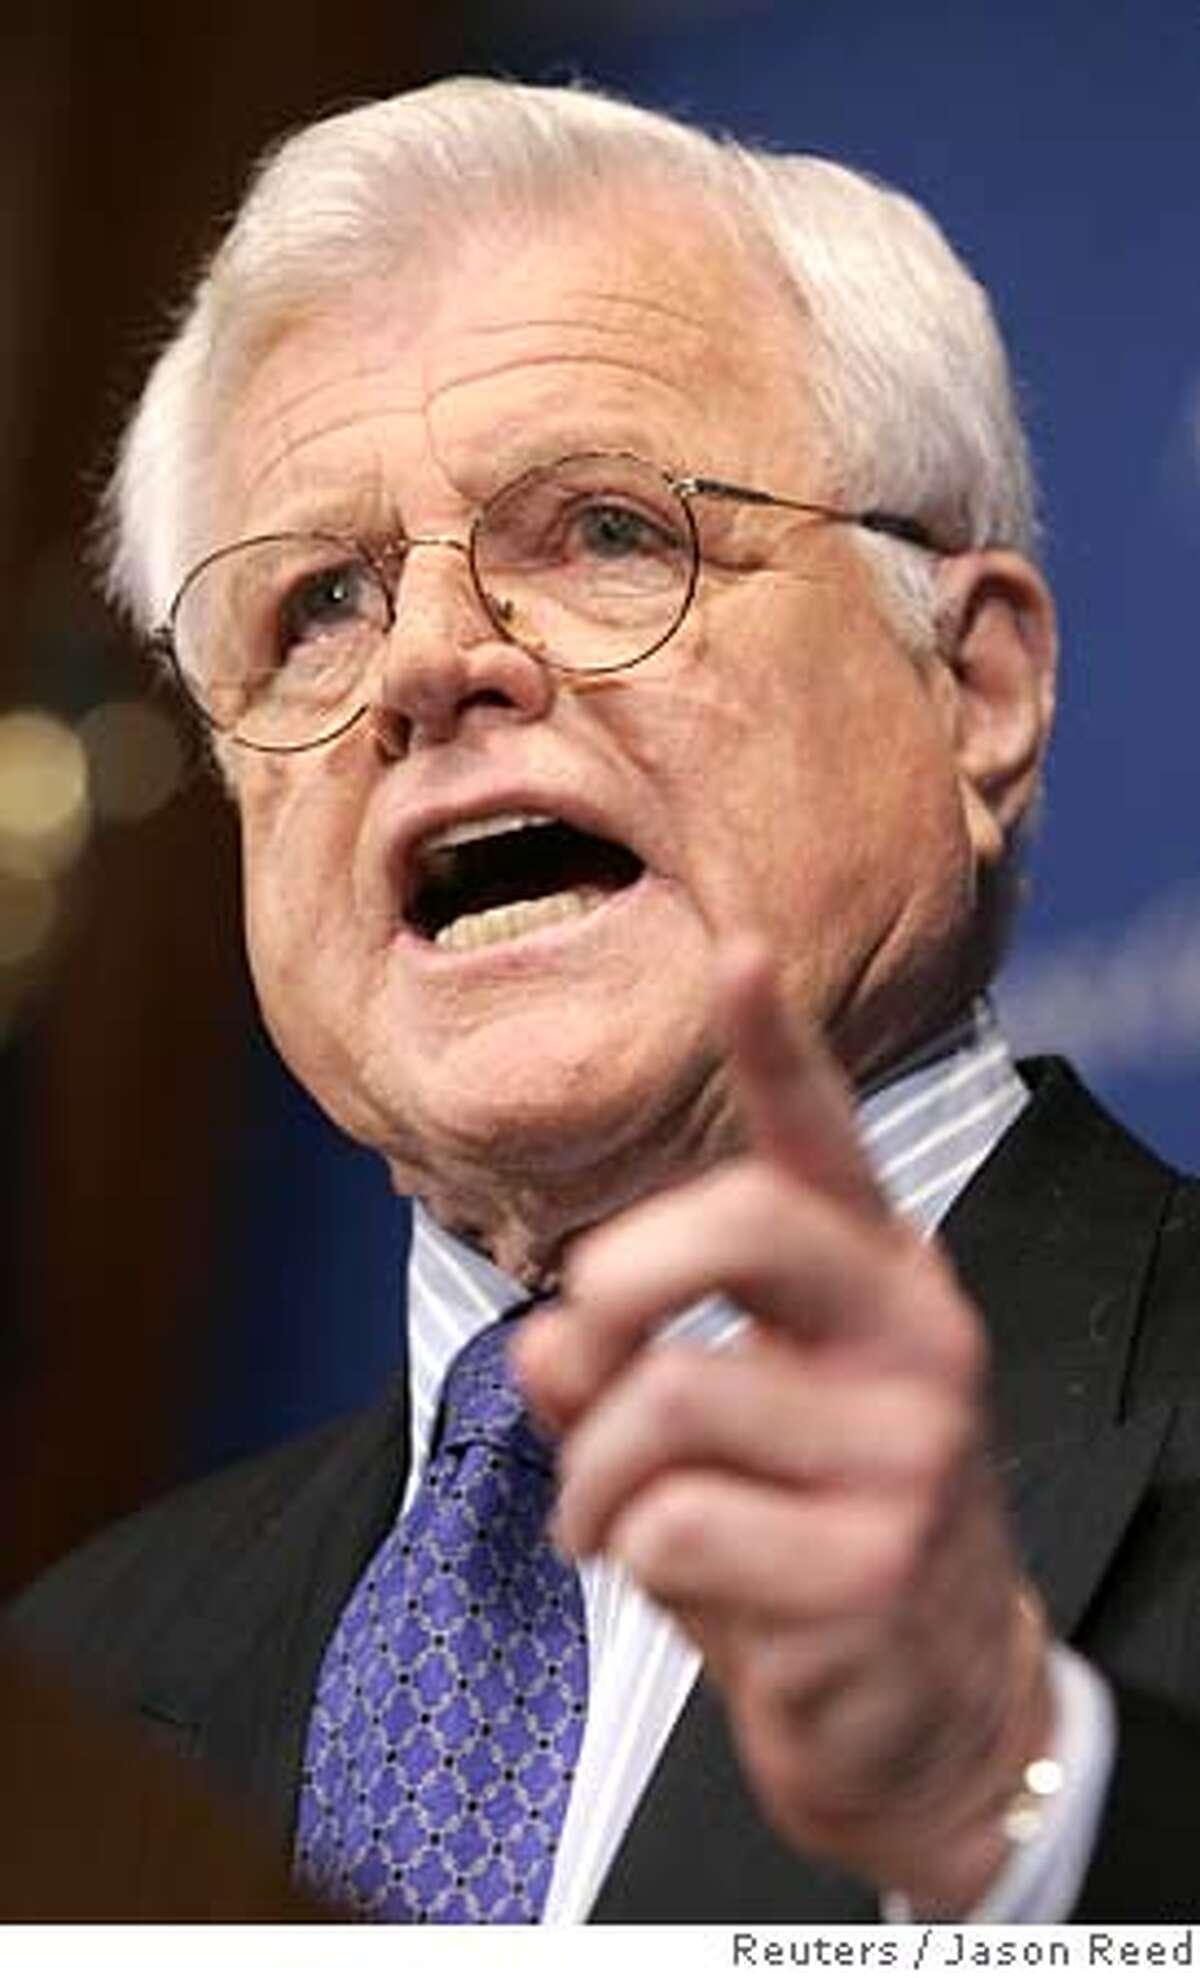 Senator Ted Kennedy speaks at a Press Club Luncheon in Washington